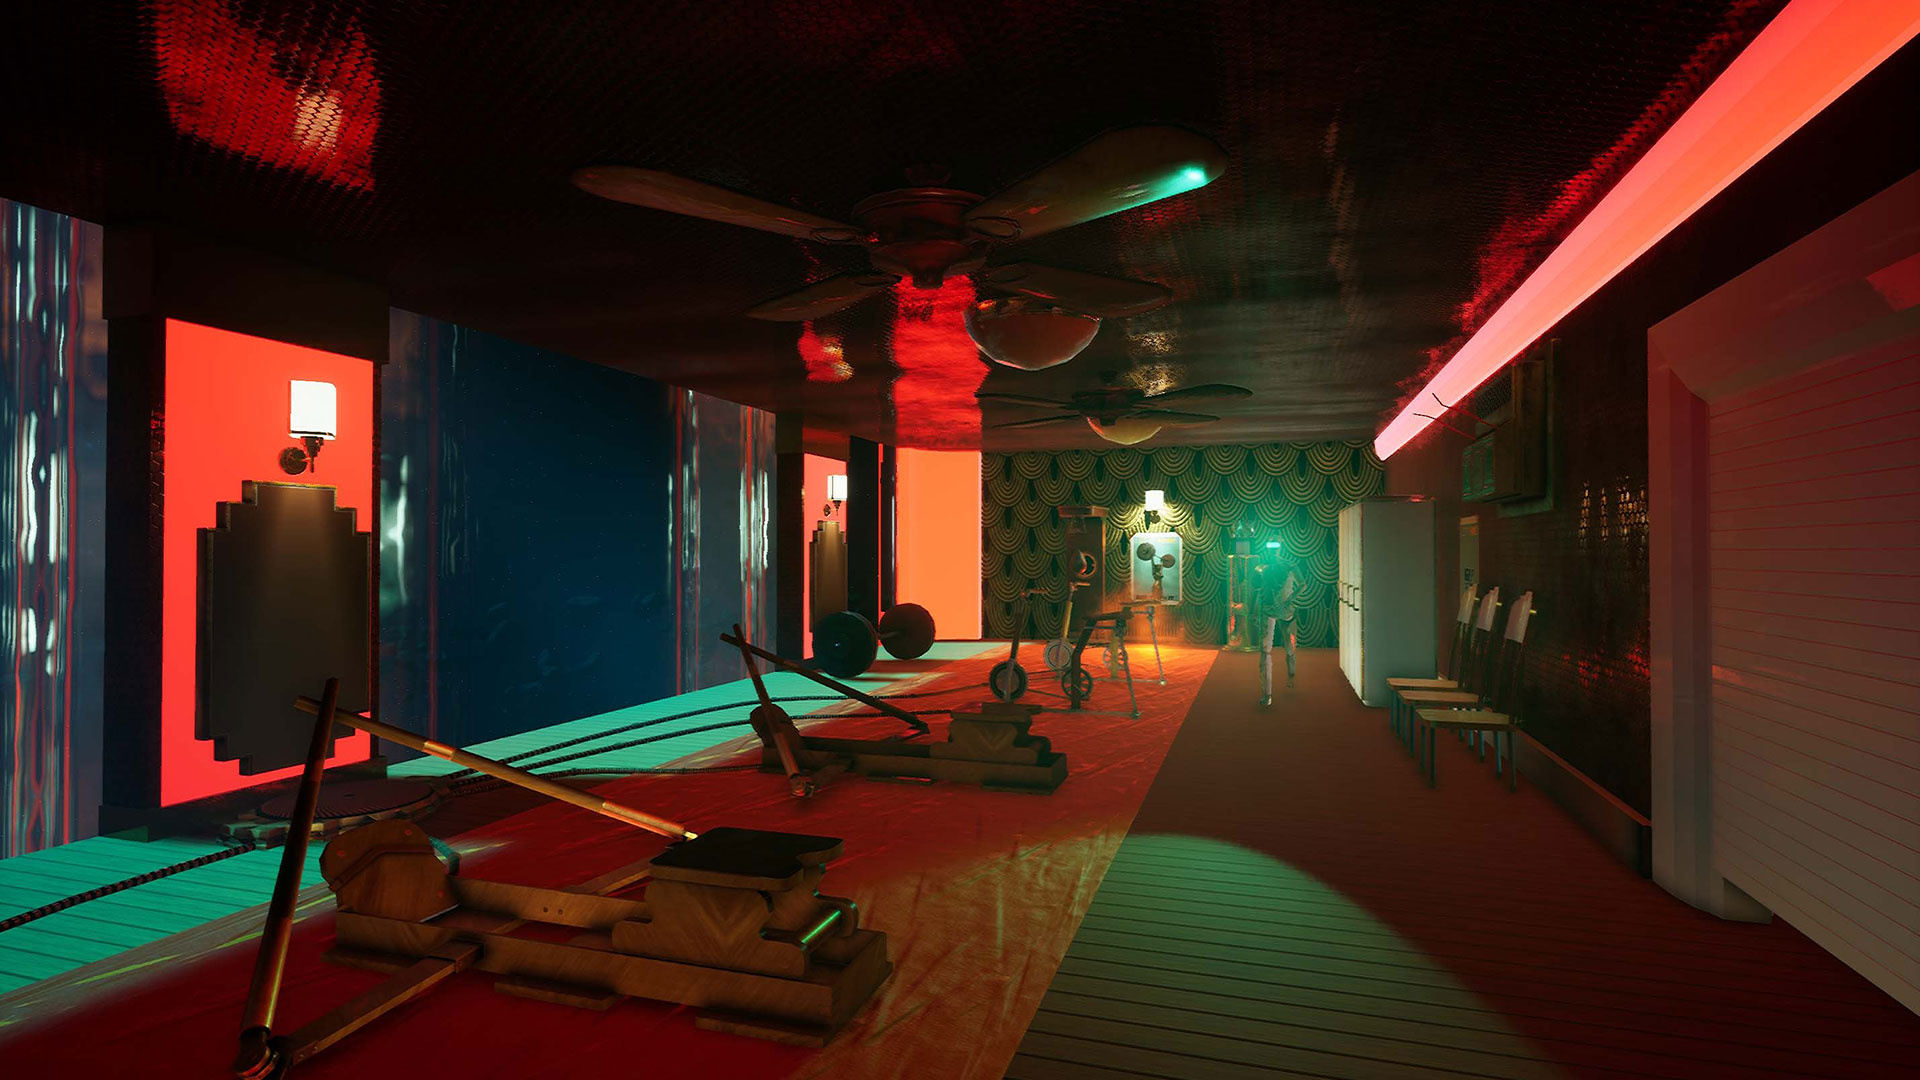 TechnoTsunami Gym